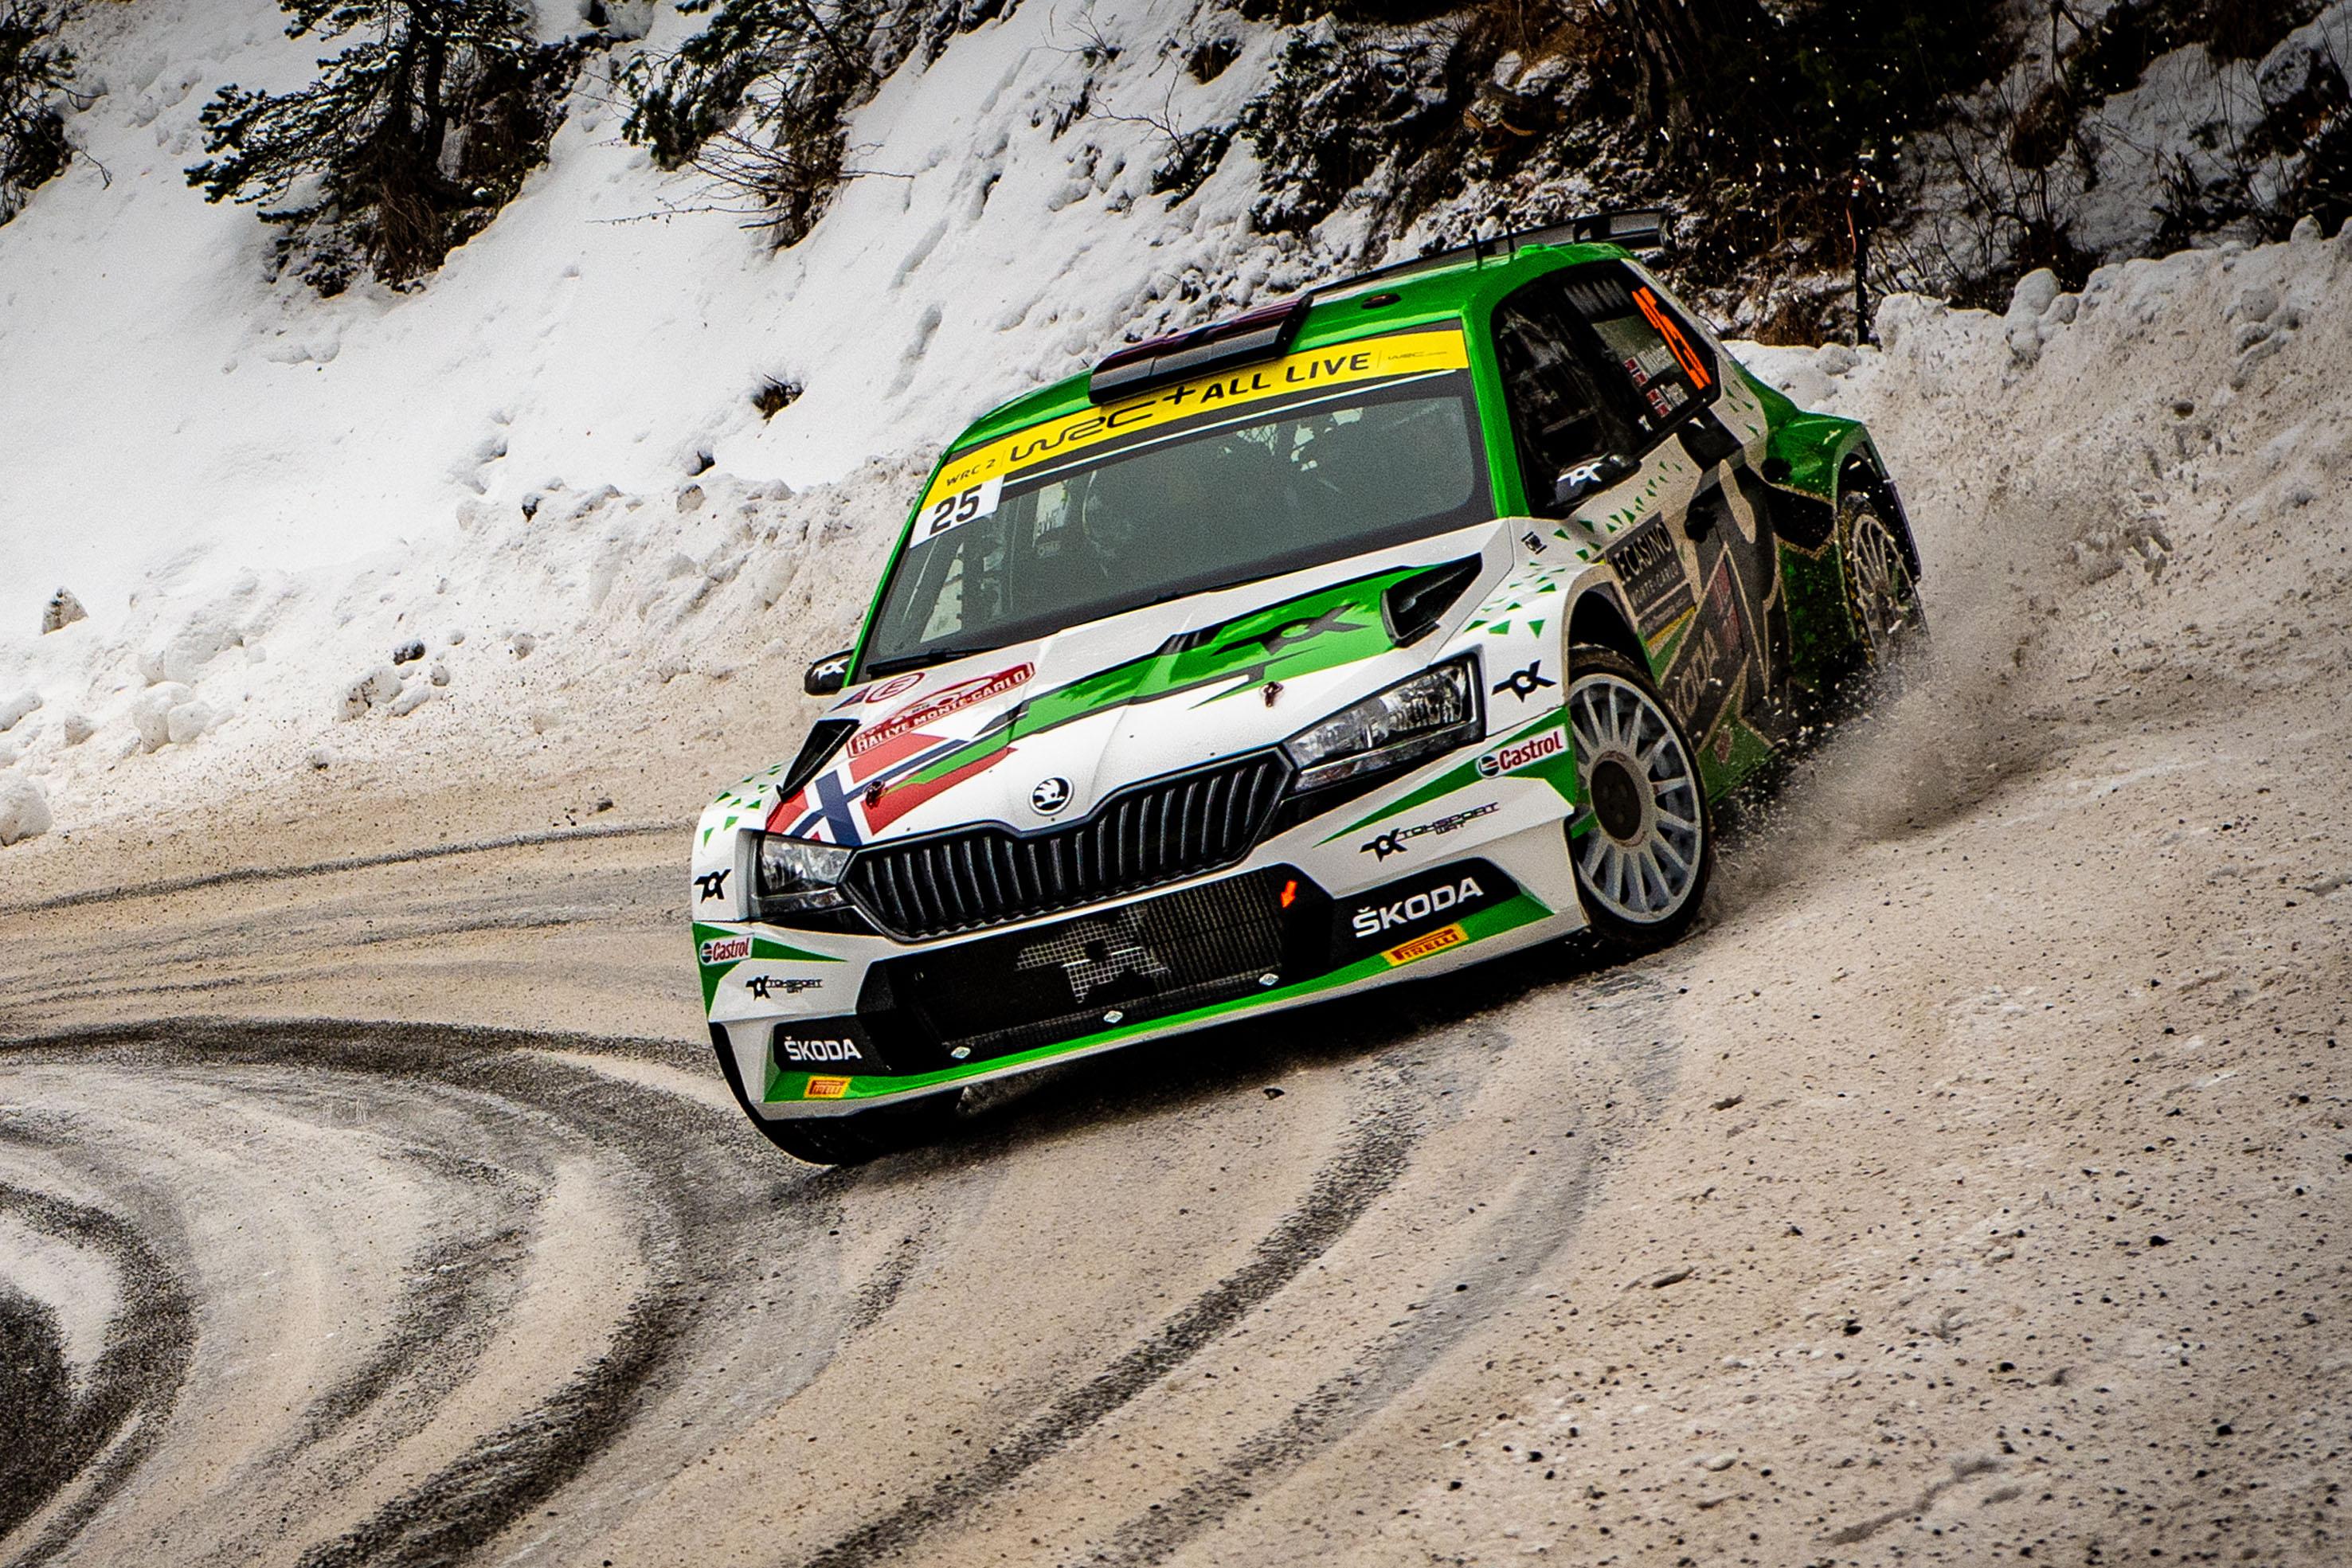 Rallye Monte-Carlo: SKODA FABIA Rally2 evo driver Mikkelsen starts as WRC2 leader into last leg - Image 2